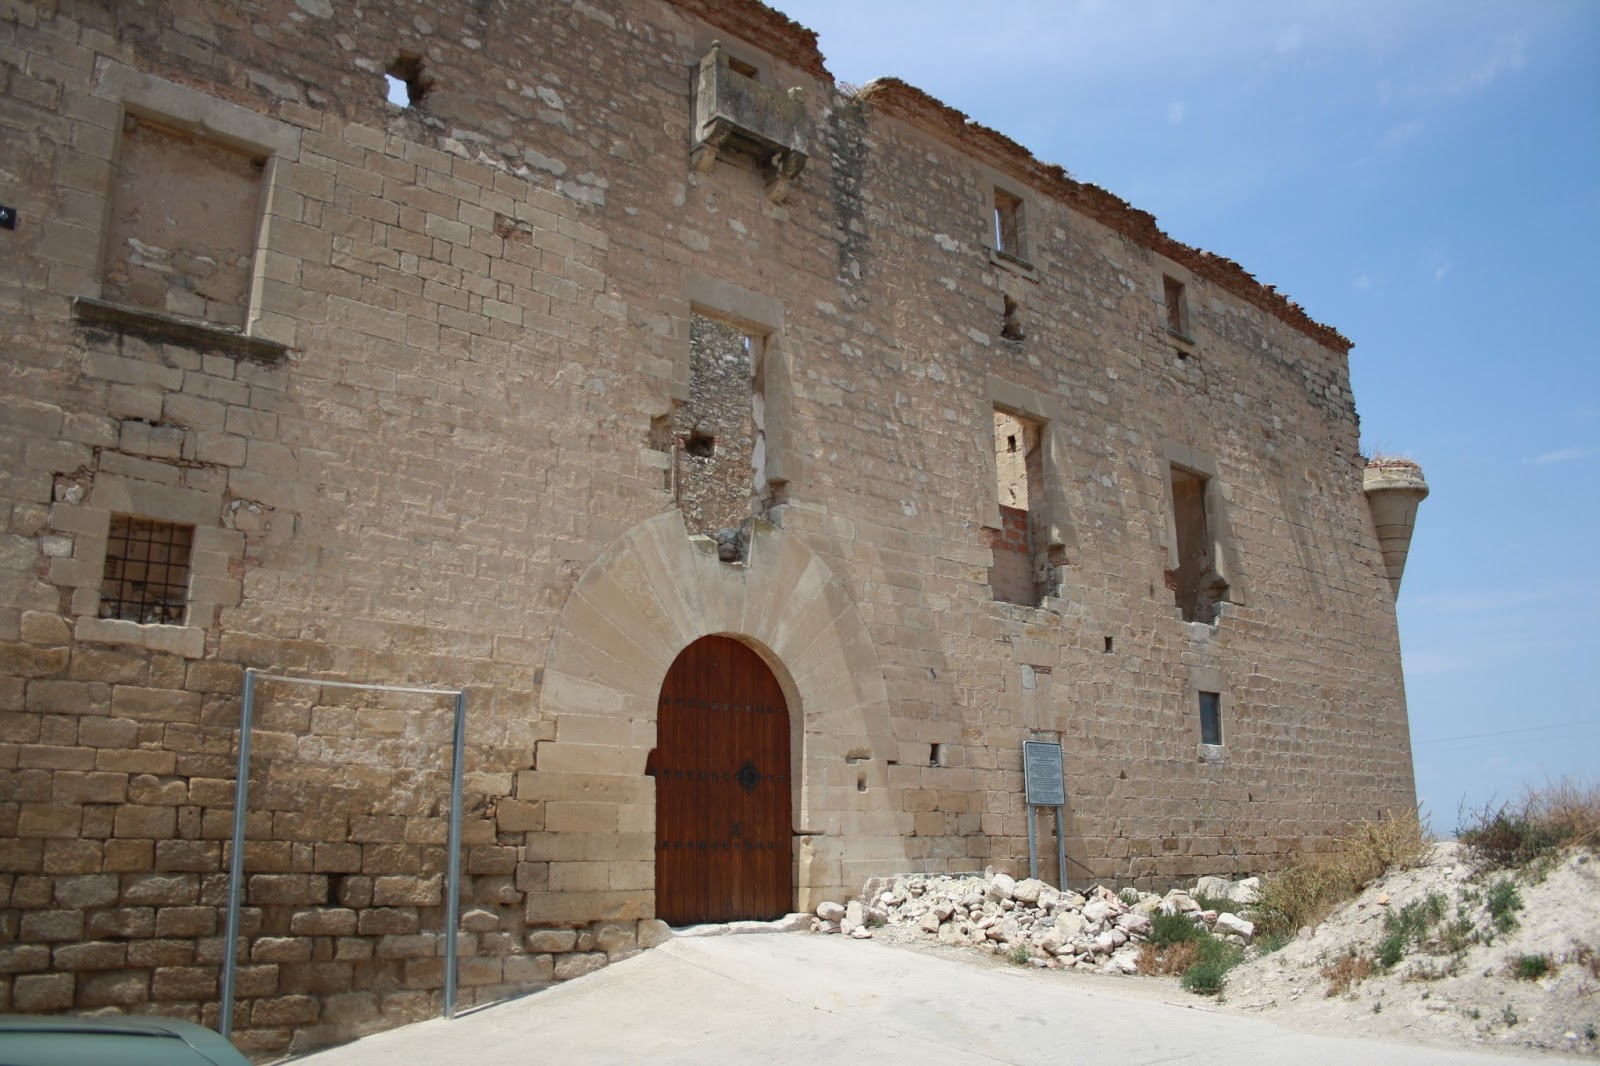 Relat el castell de mald l urgell juss lleida for Malda lleida